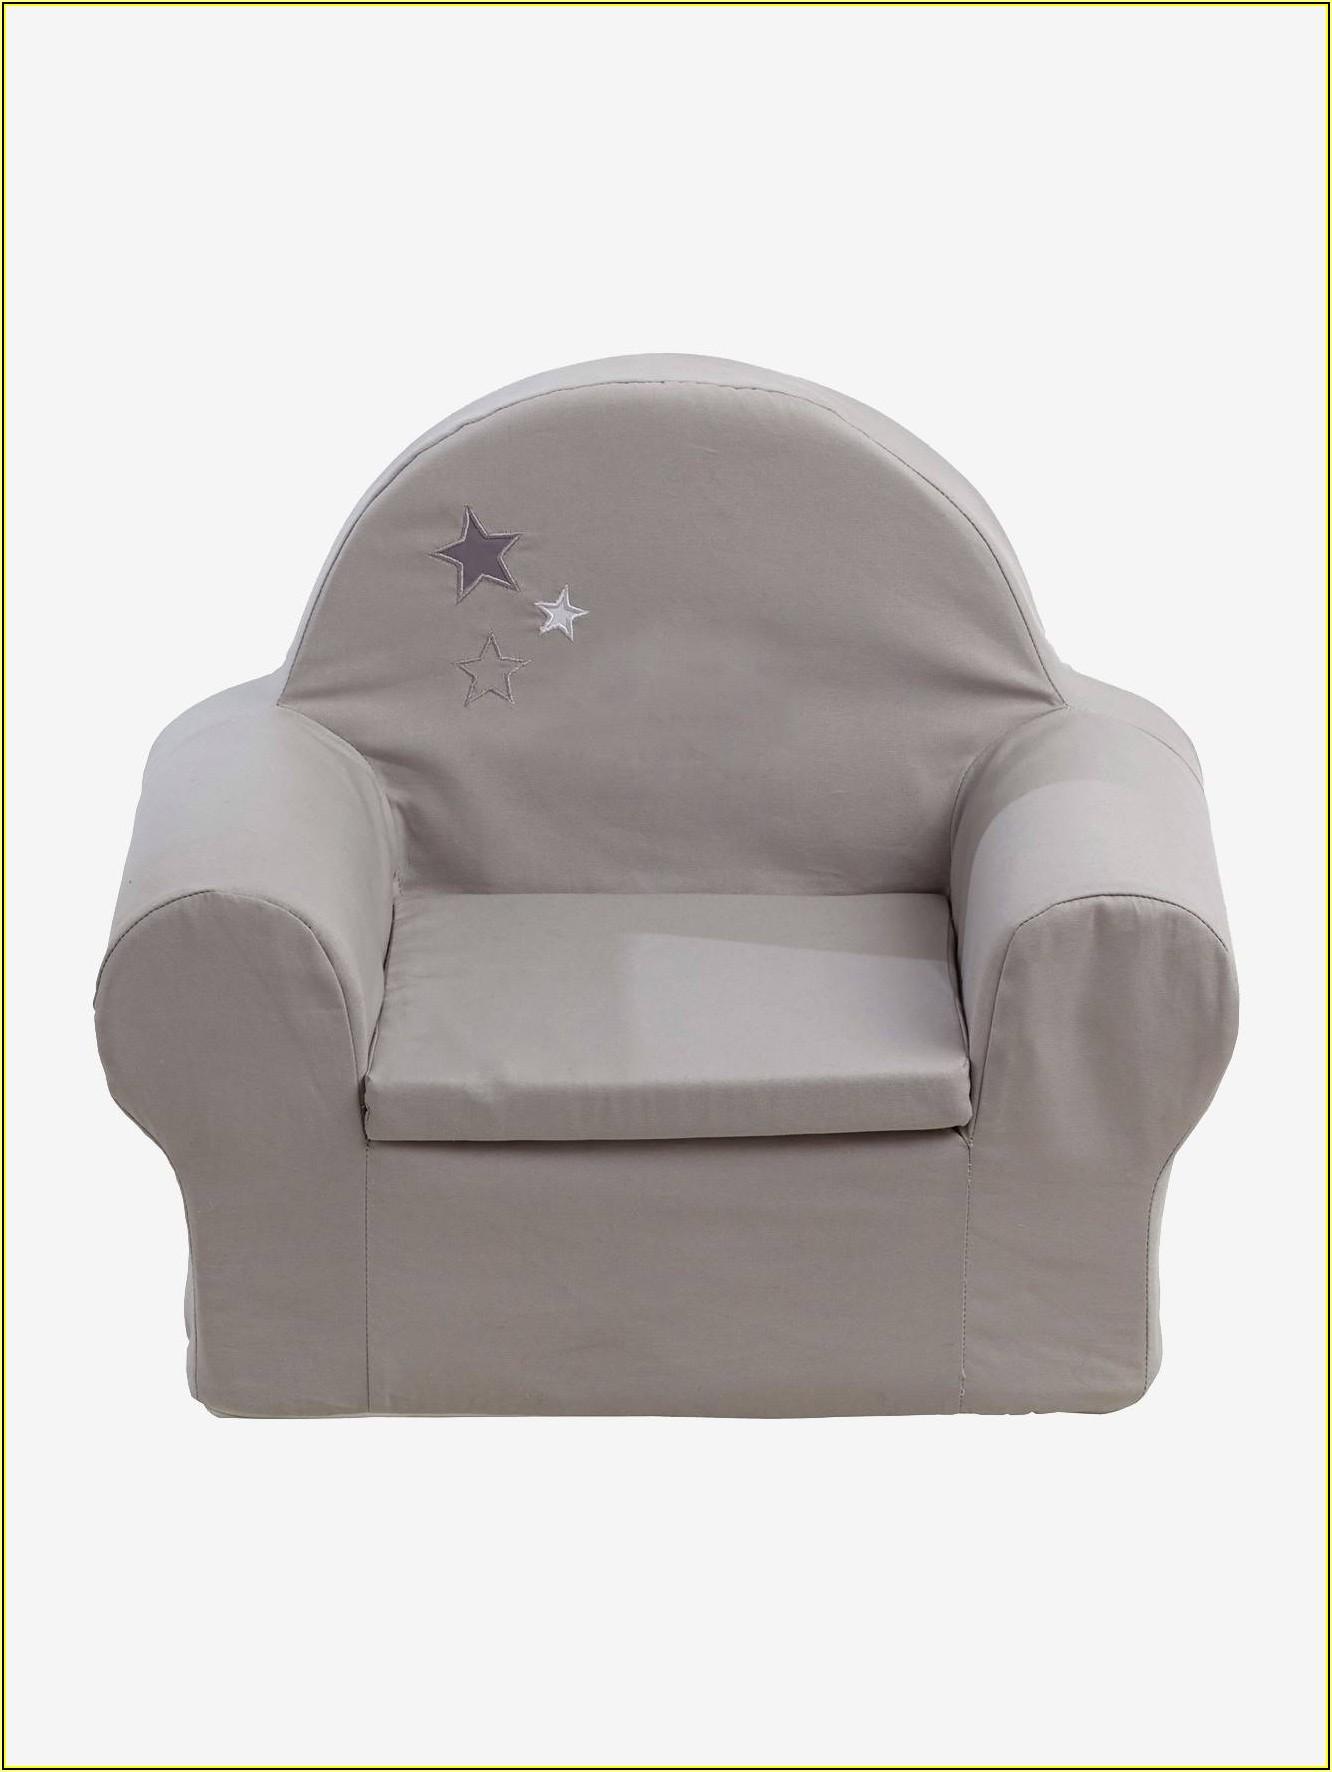 Bequeme Sessel Für Kinder